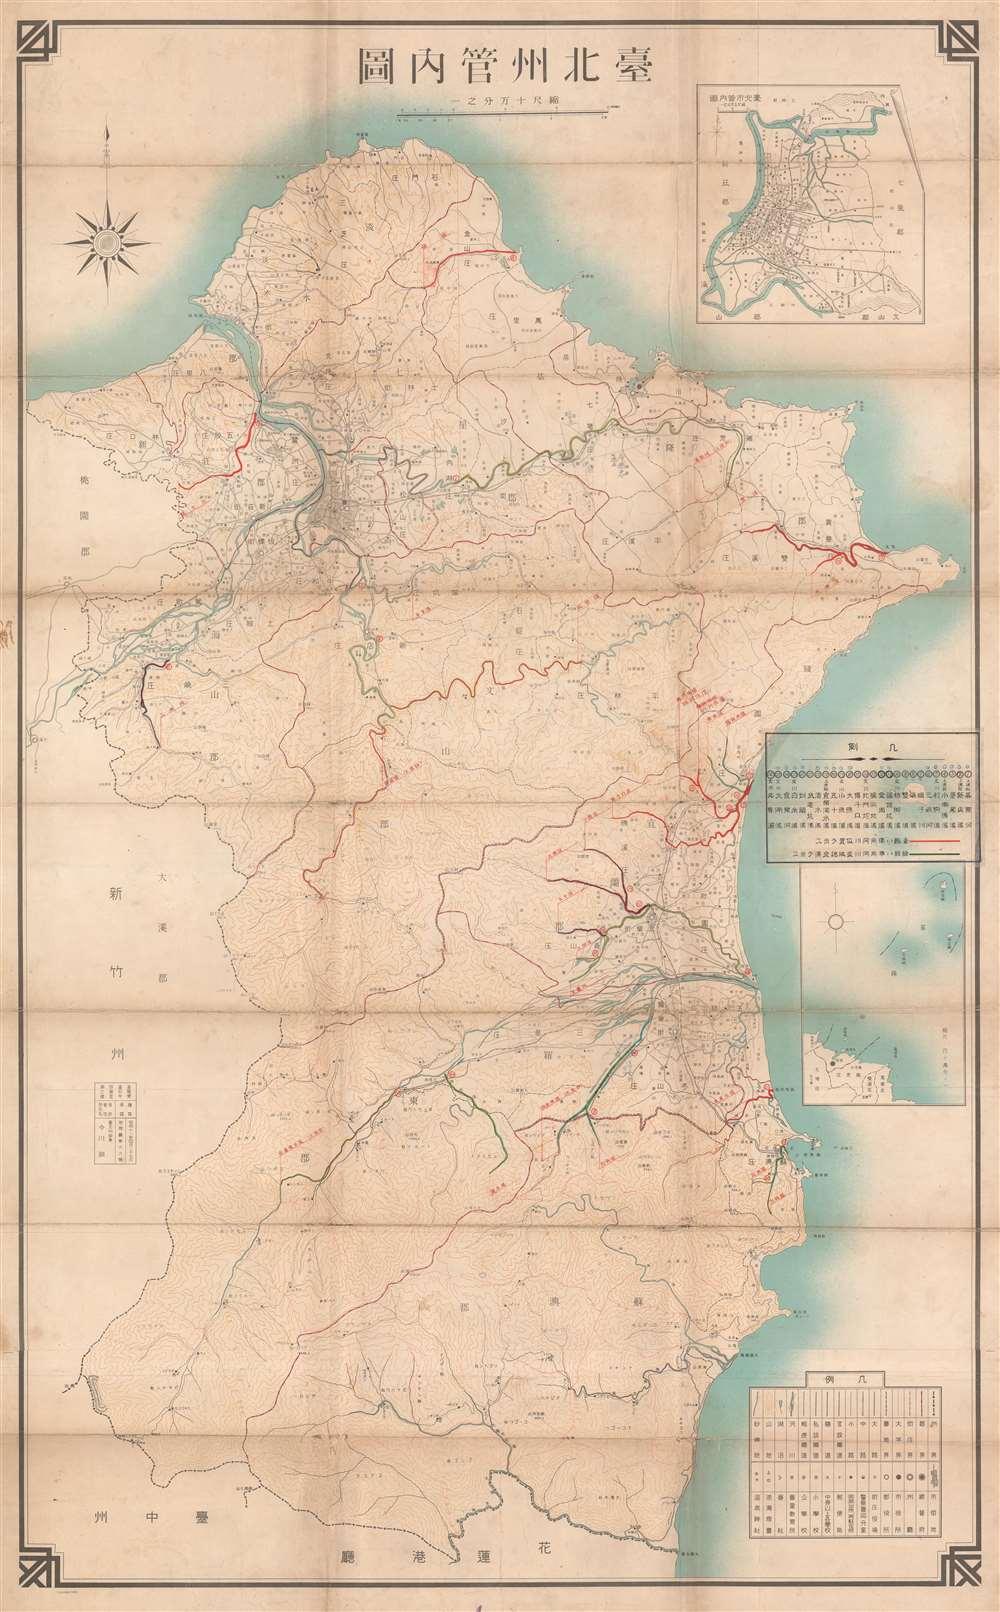 1936 Showa 11 Administrative Map of Taipei District, Taiwan w/ manuscript